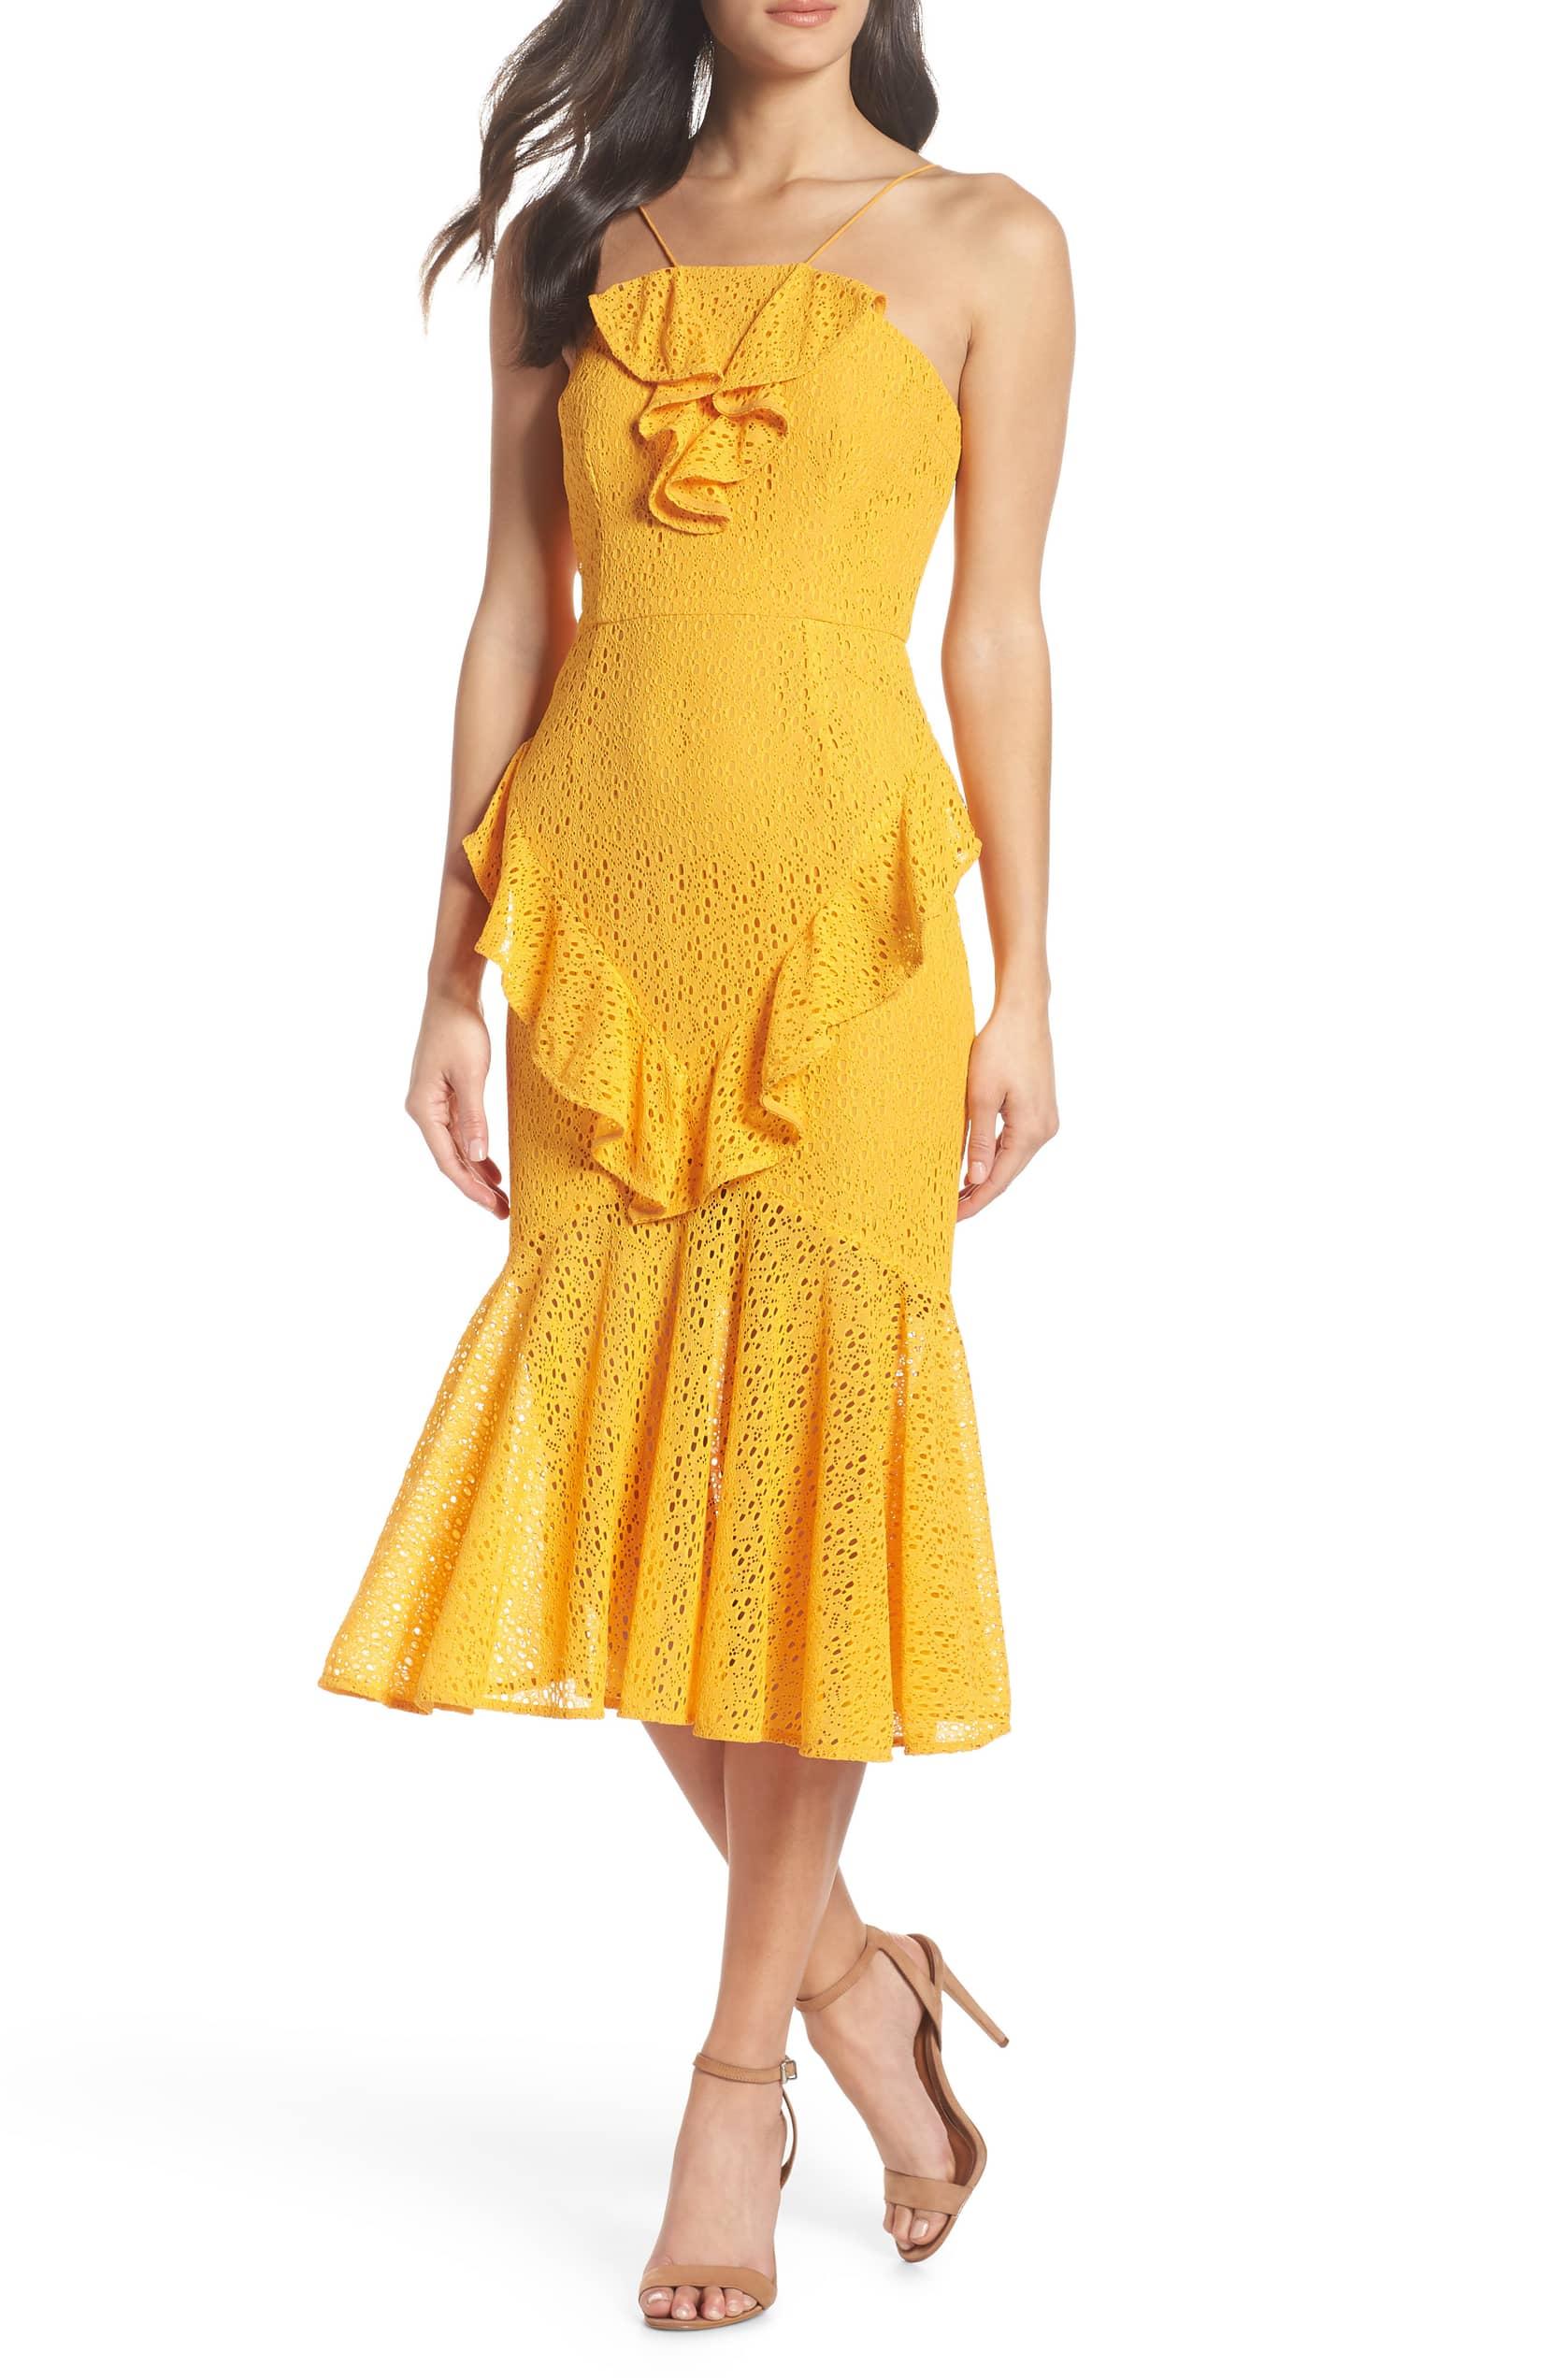 Cooper St Garland Frill Lace Midi Dress